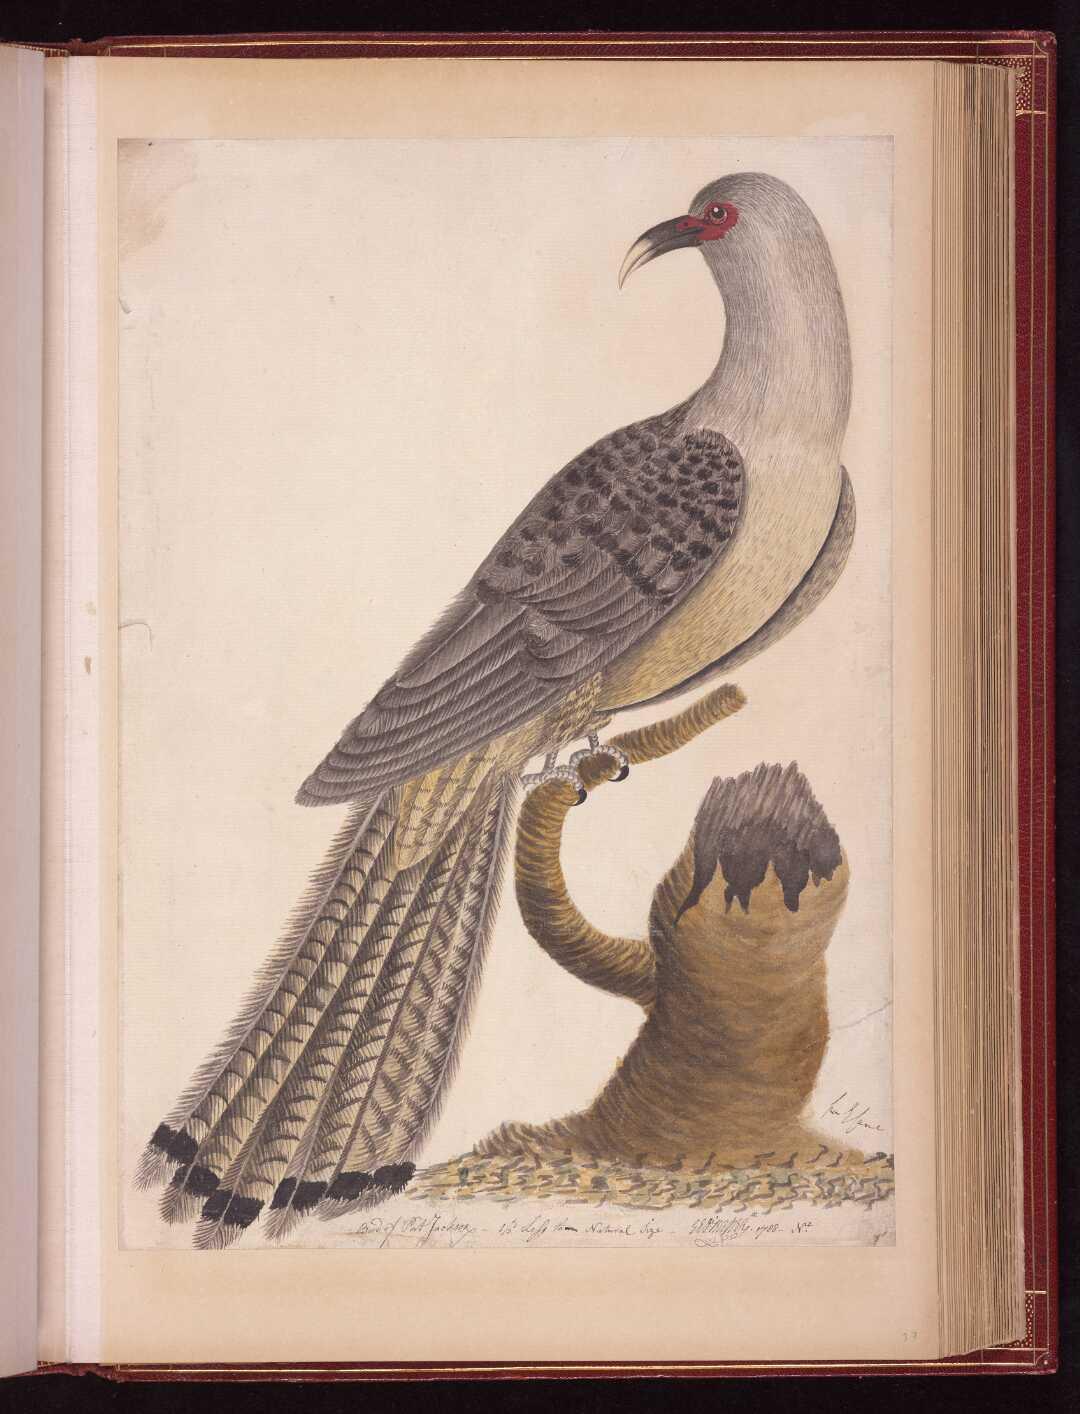 Bird of Port Jackson 1/3 less than Natural Size